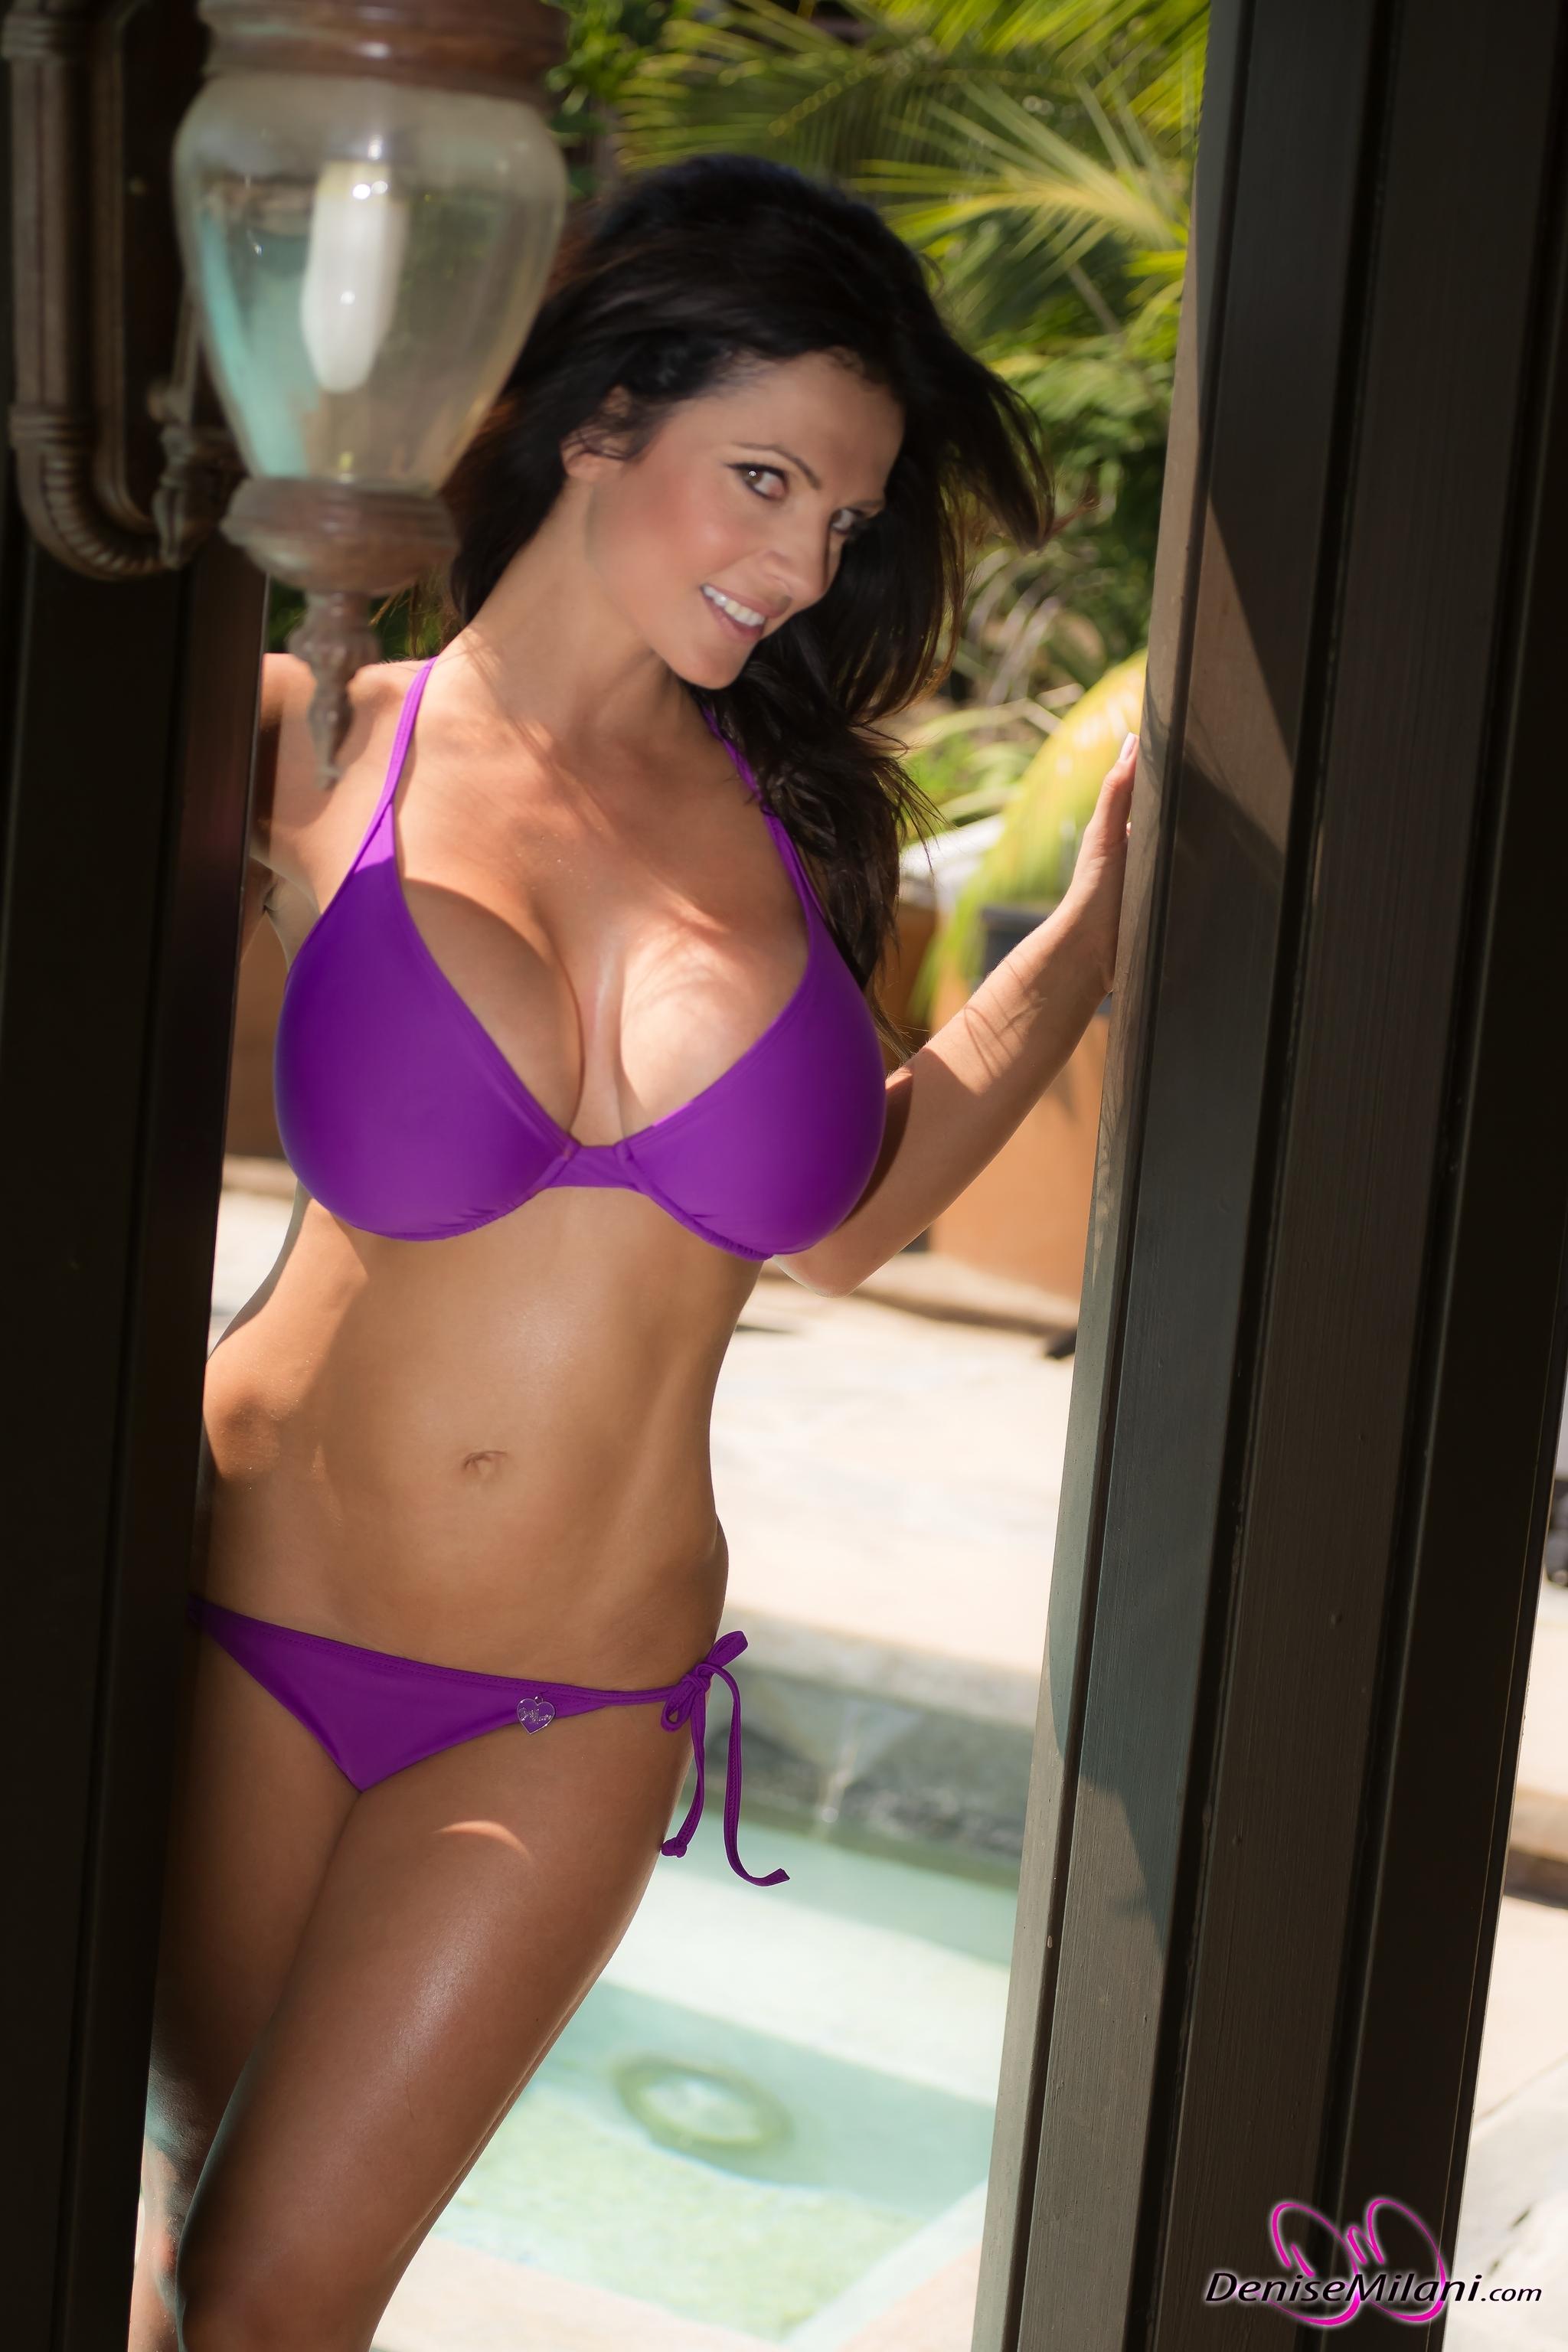 Denise milani bikini fotos